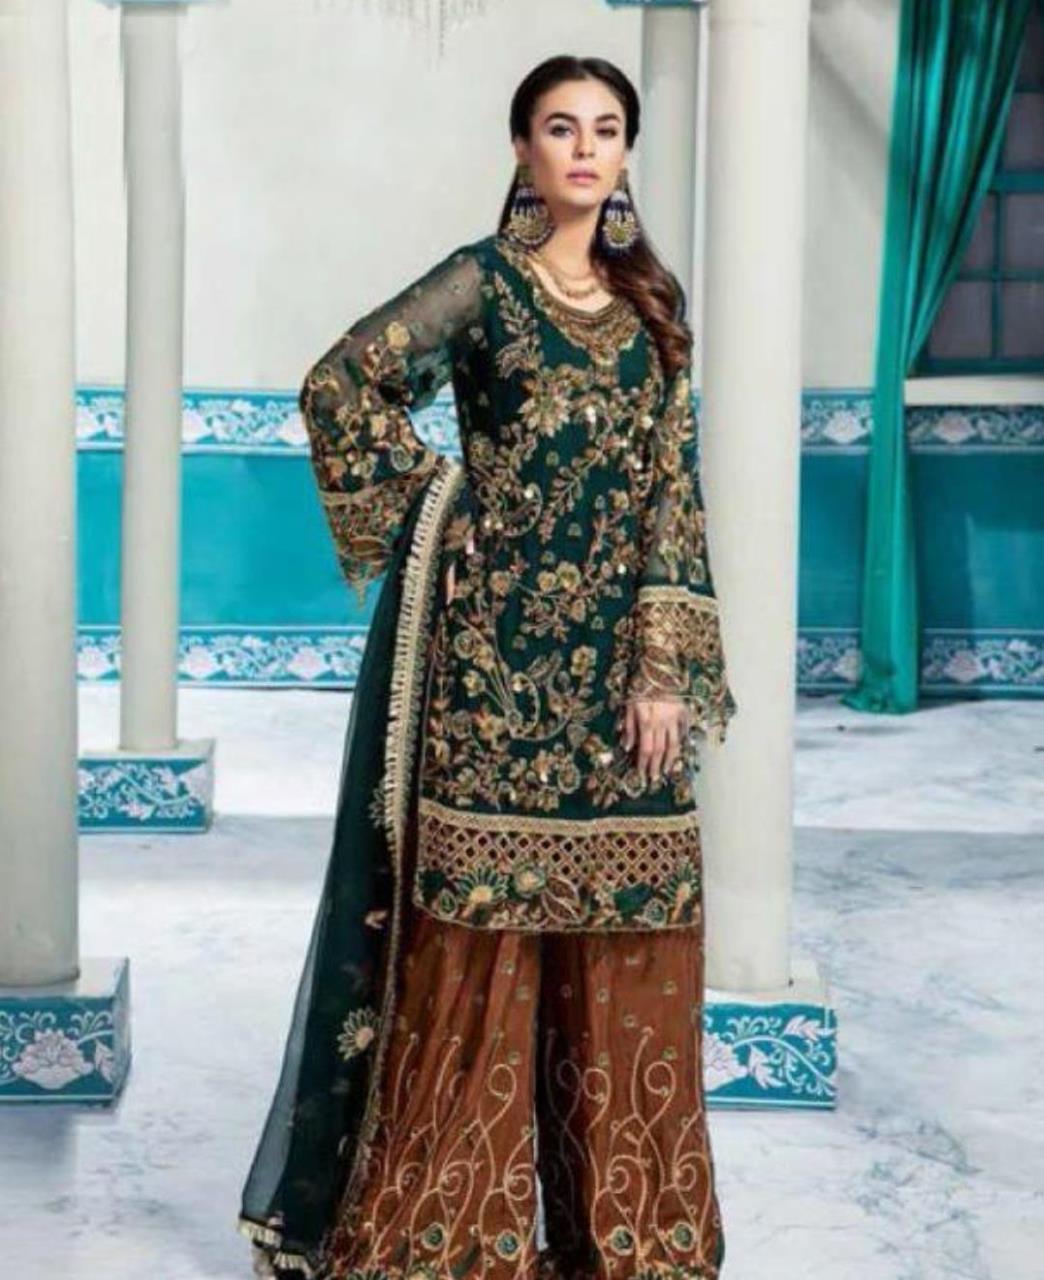 Embroidered Georgette Straight cut Salwar Kameez in Bottel Green